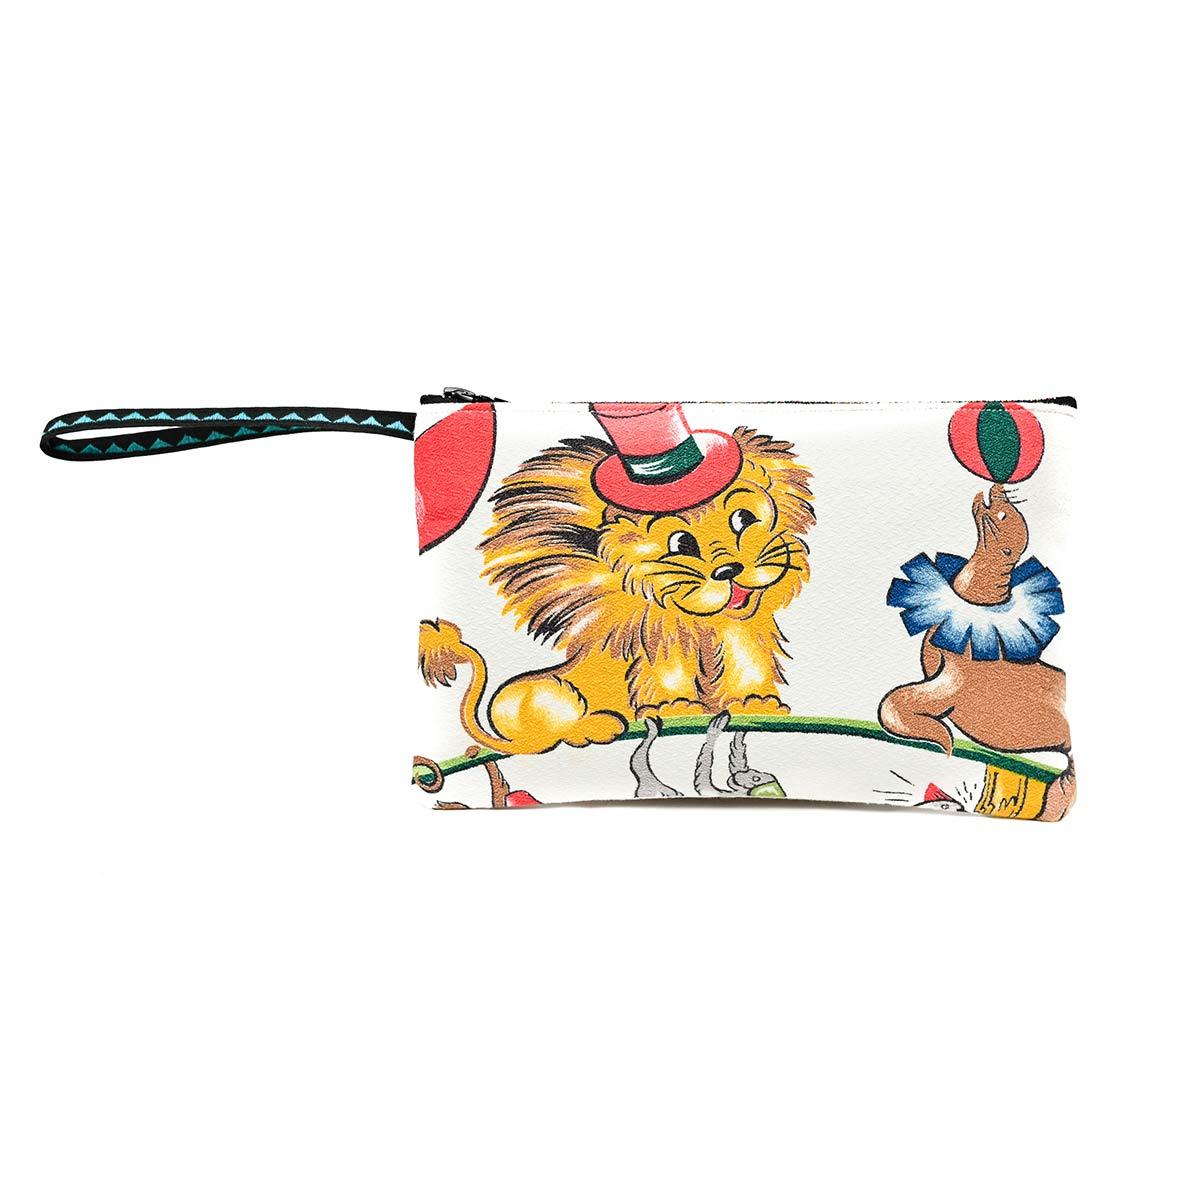 clutch bag 1950s childrens motif 2